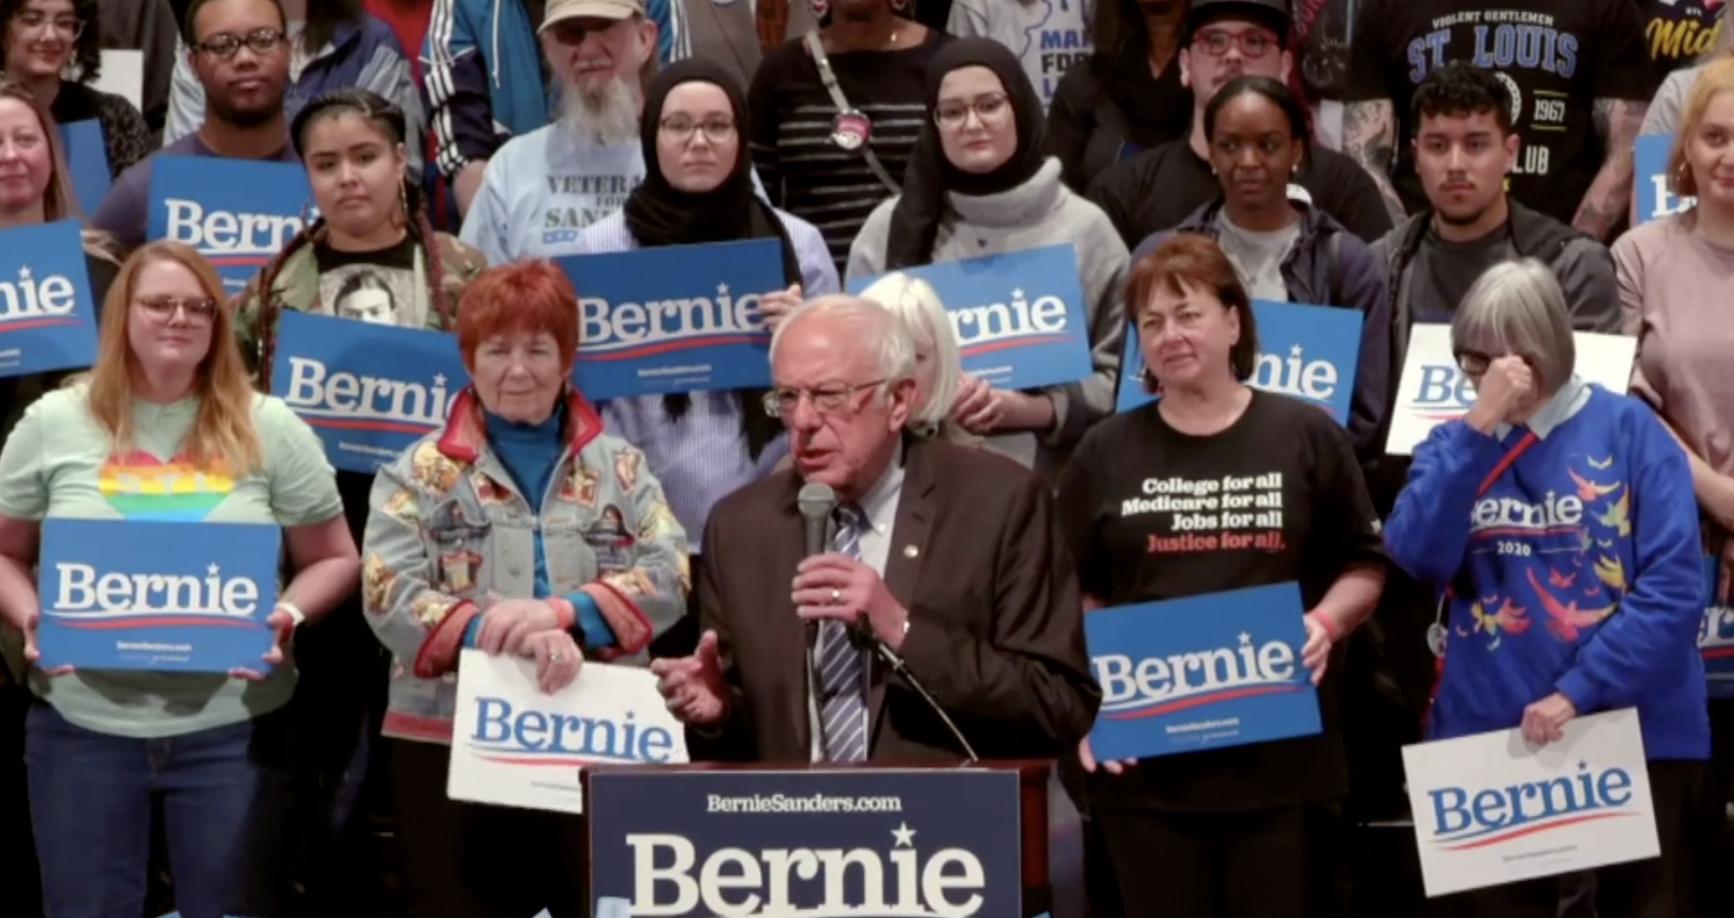 Sanders at St. Louis Rally